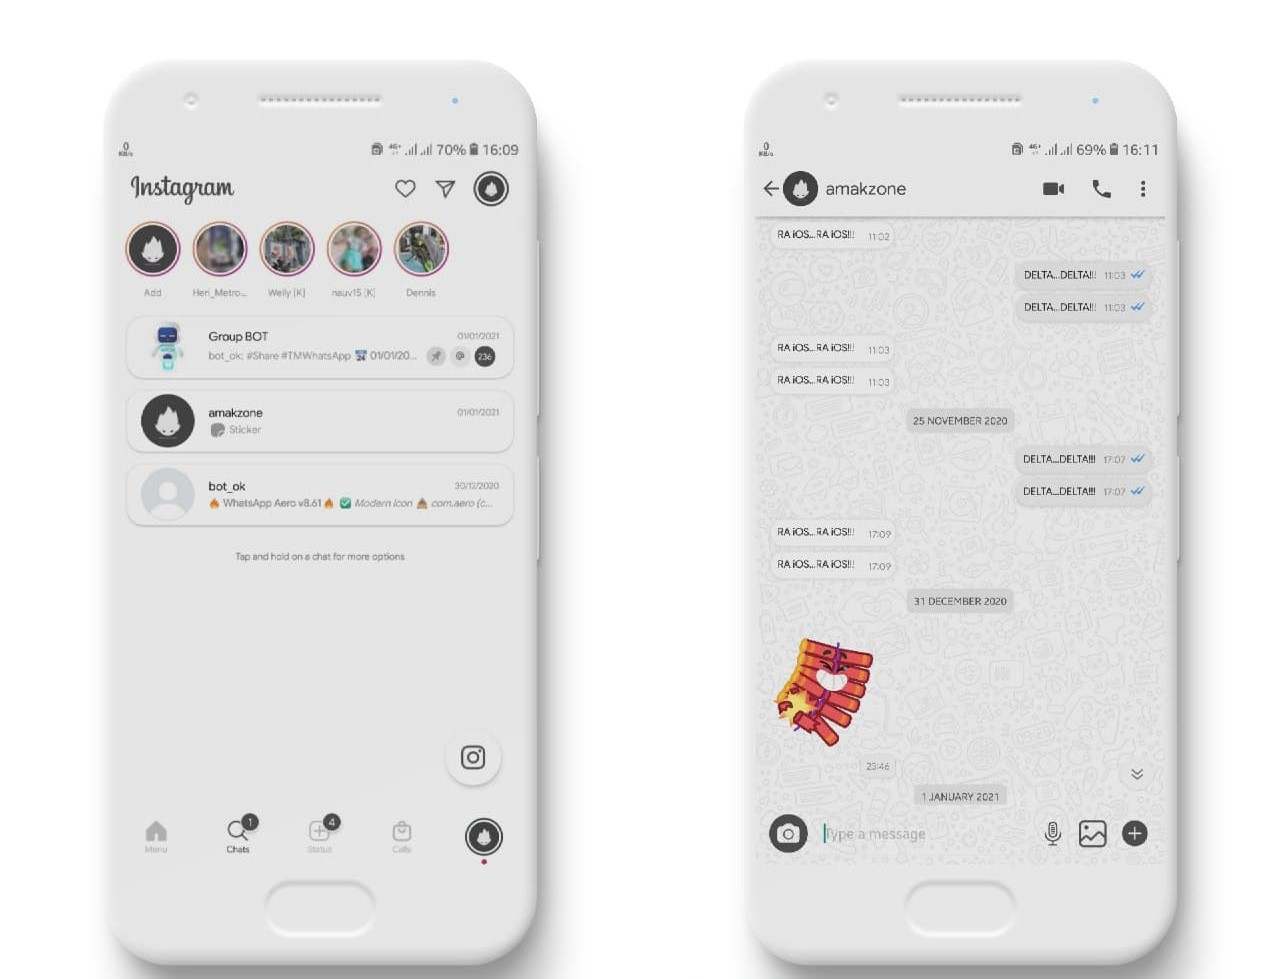 Instagram Theme For YOWhatsApp & Delta WhatsApp By Amakzone   YO ...